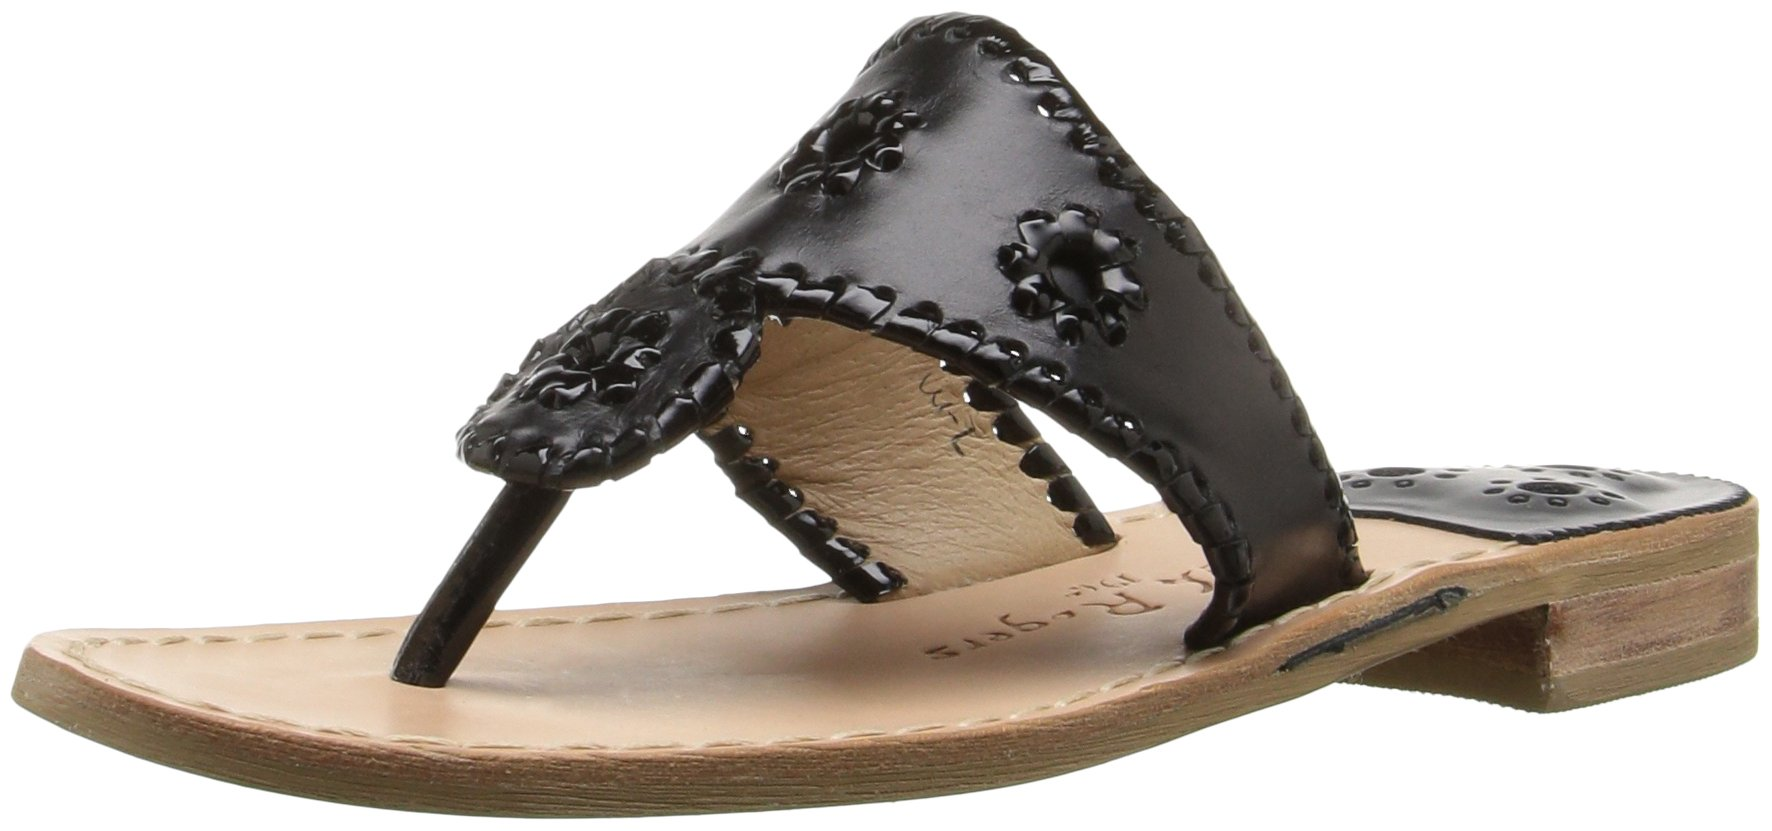 Jack Rogers Women's Palm Beach Navajo Classic Sandal,Black/Black Patent,12 M